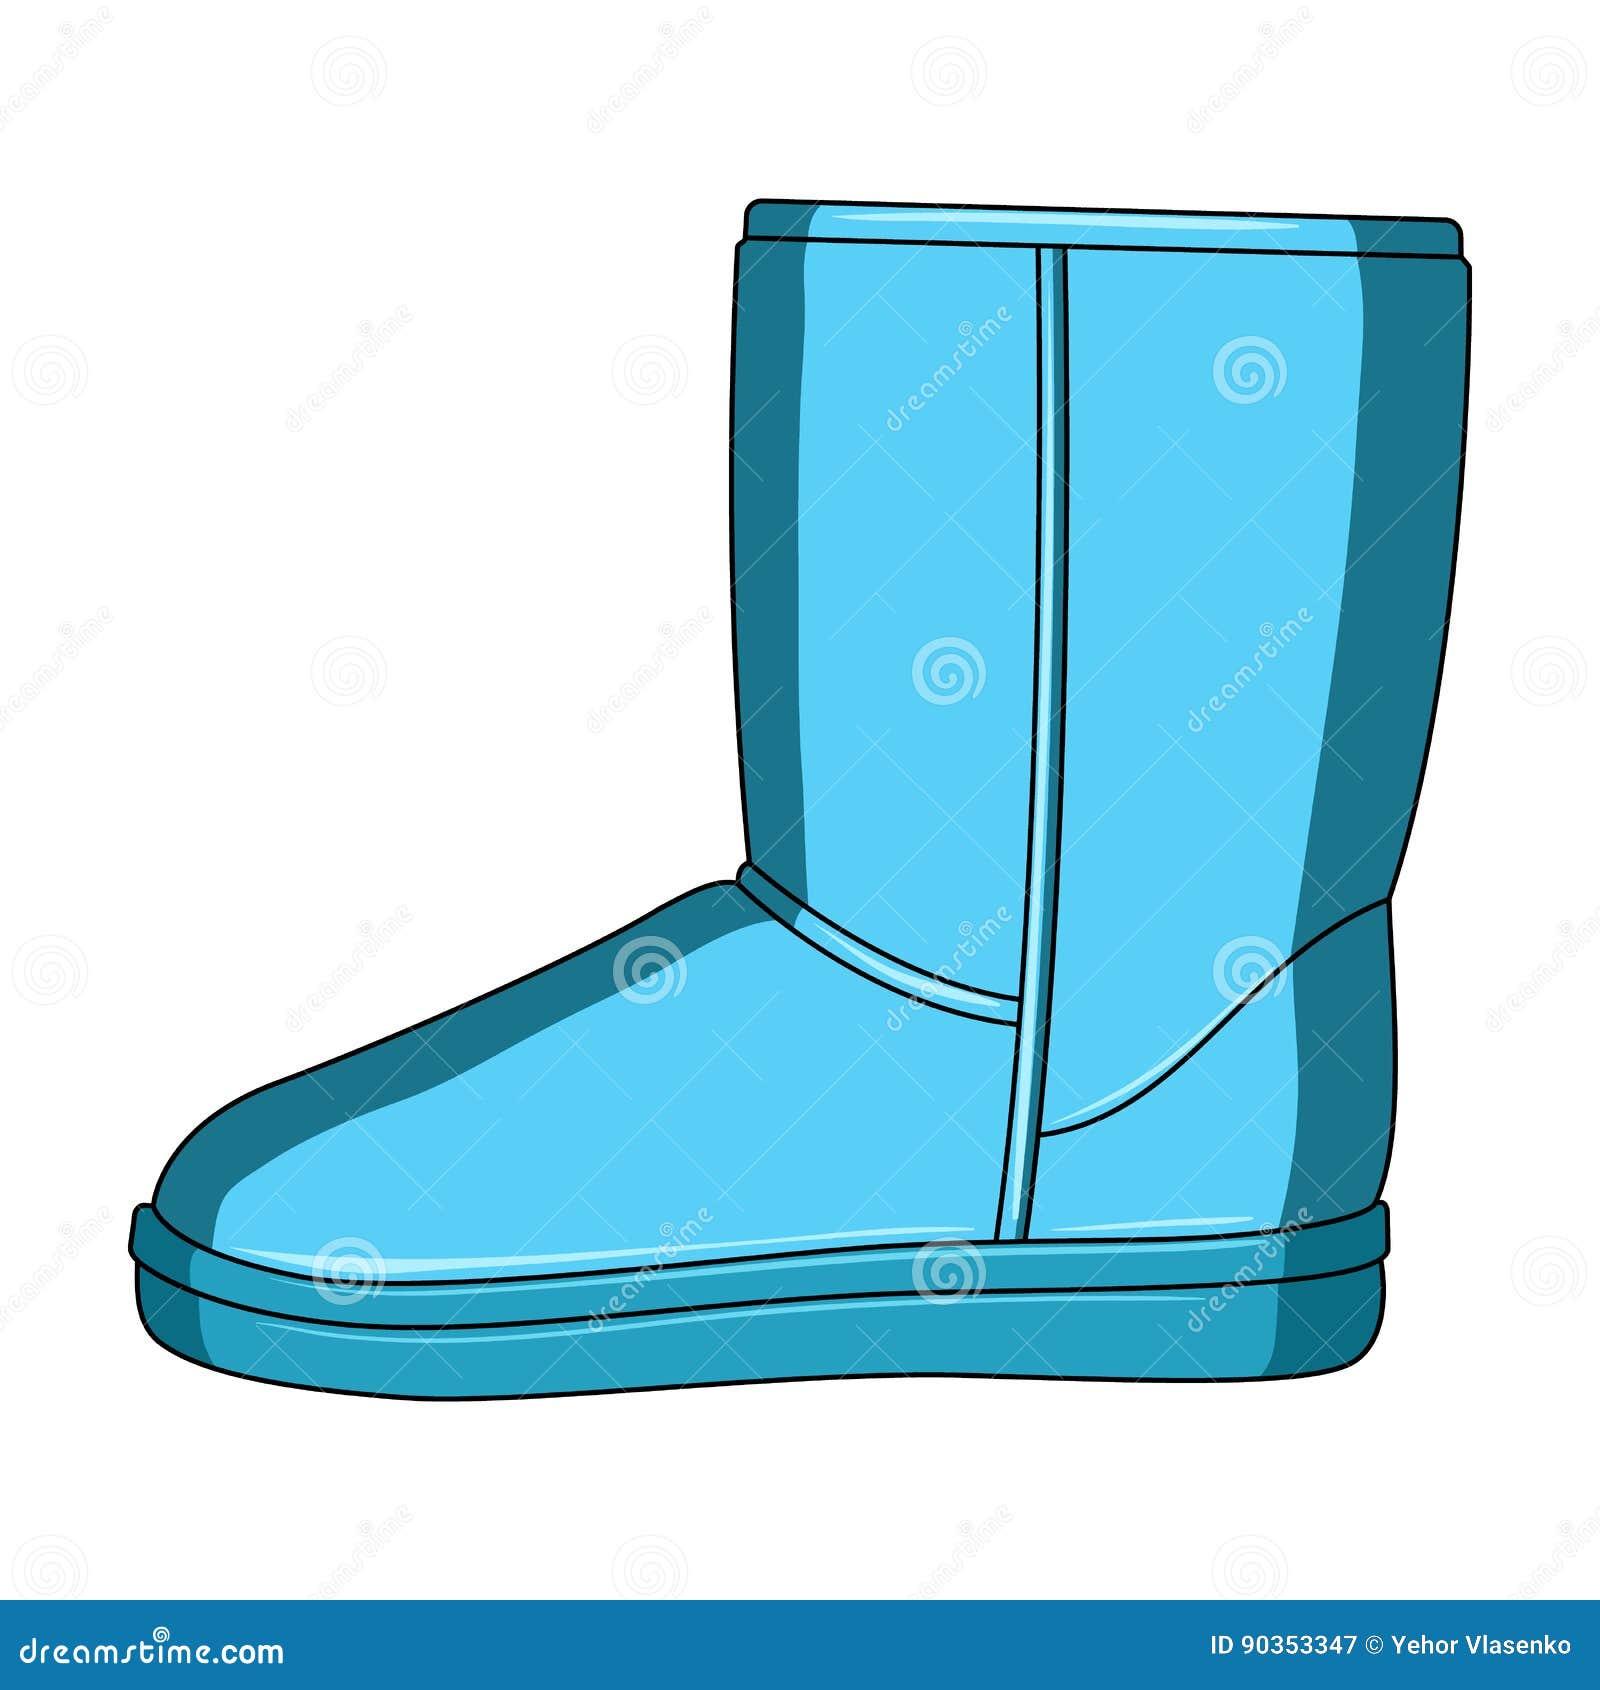 symbol vc5090 cold boot